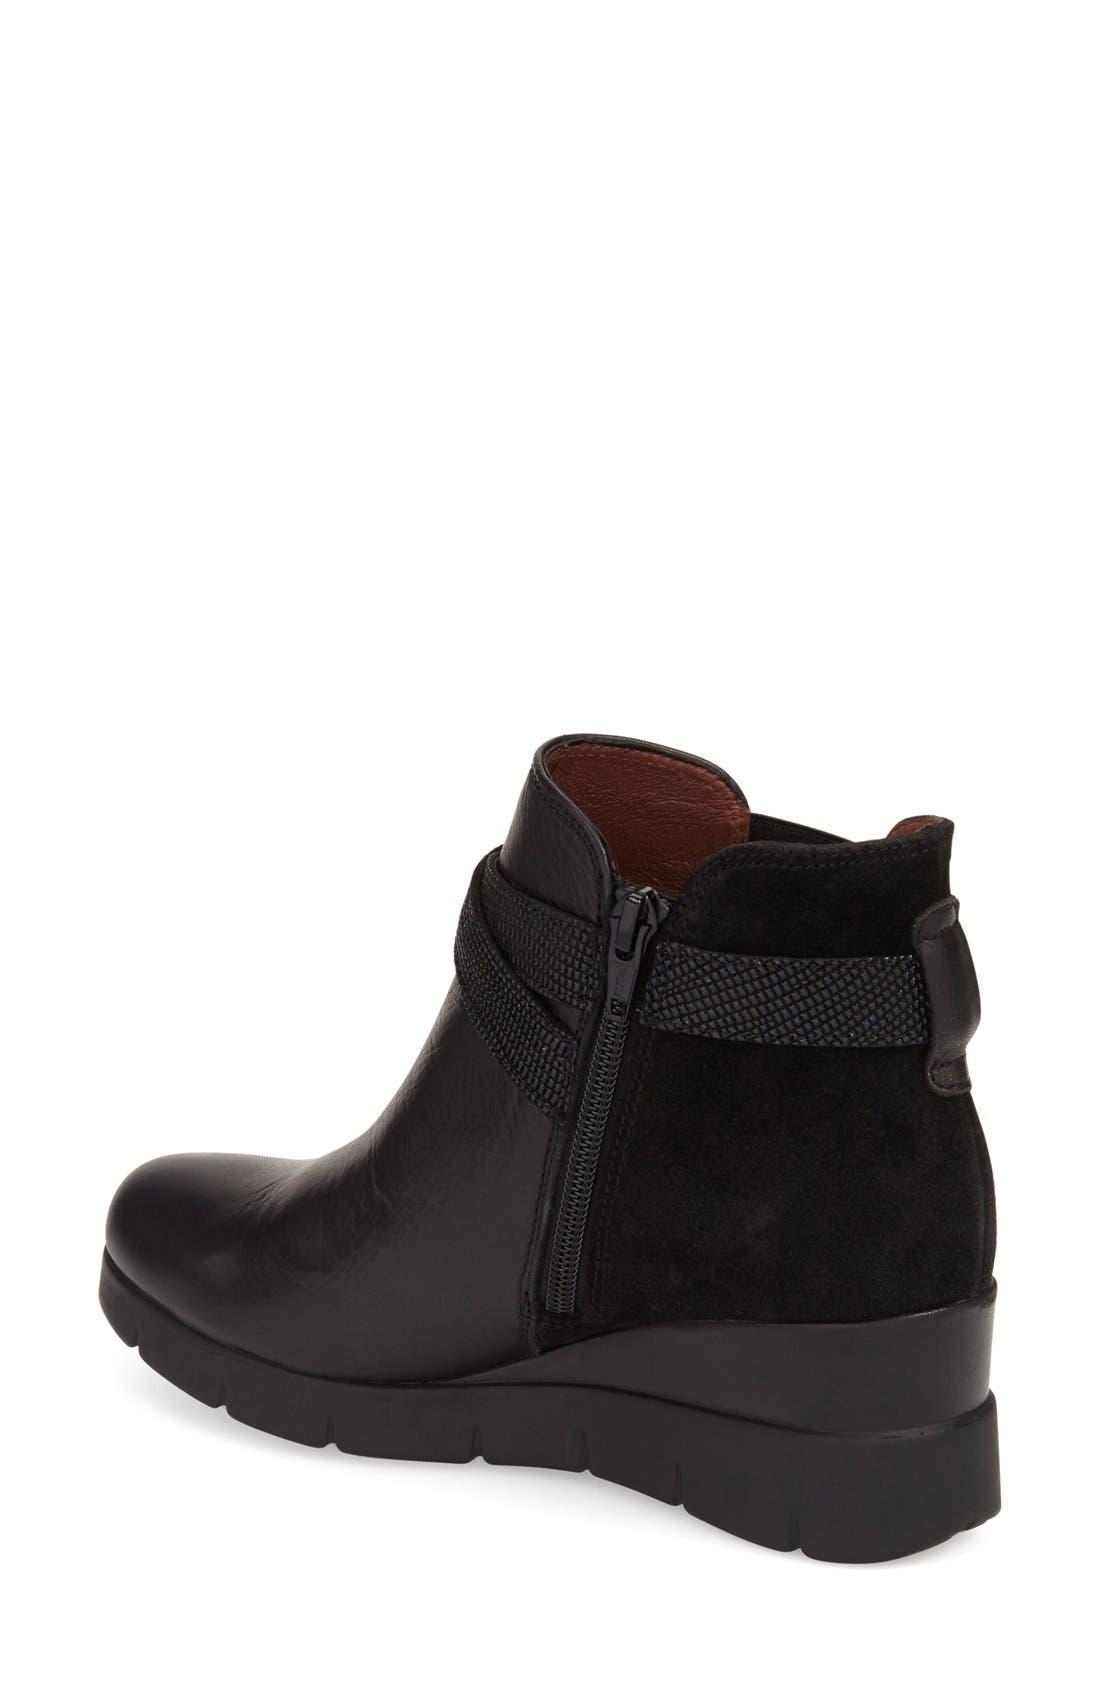 'Larae' Wedge Bootie,                             Alternate thumbnail 2, color,                             Soho Black Leather